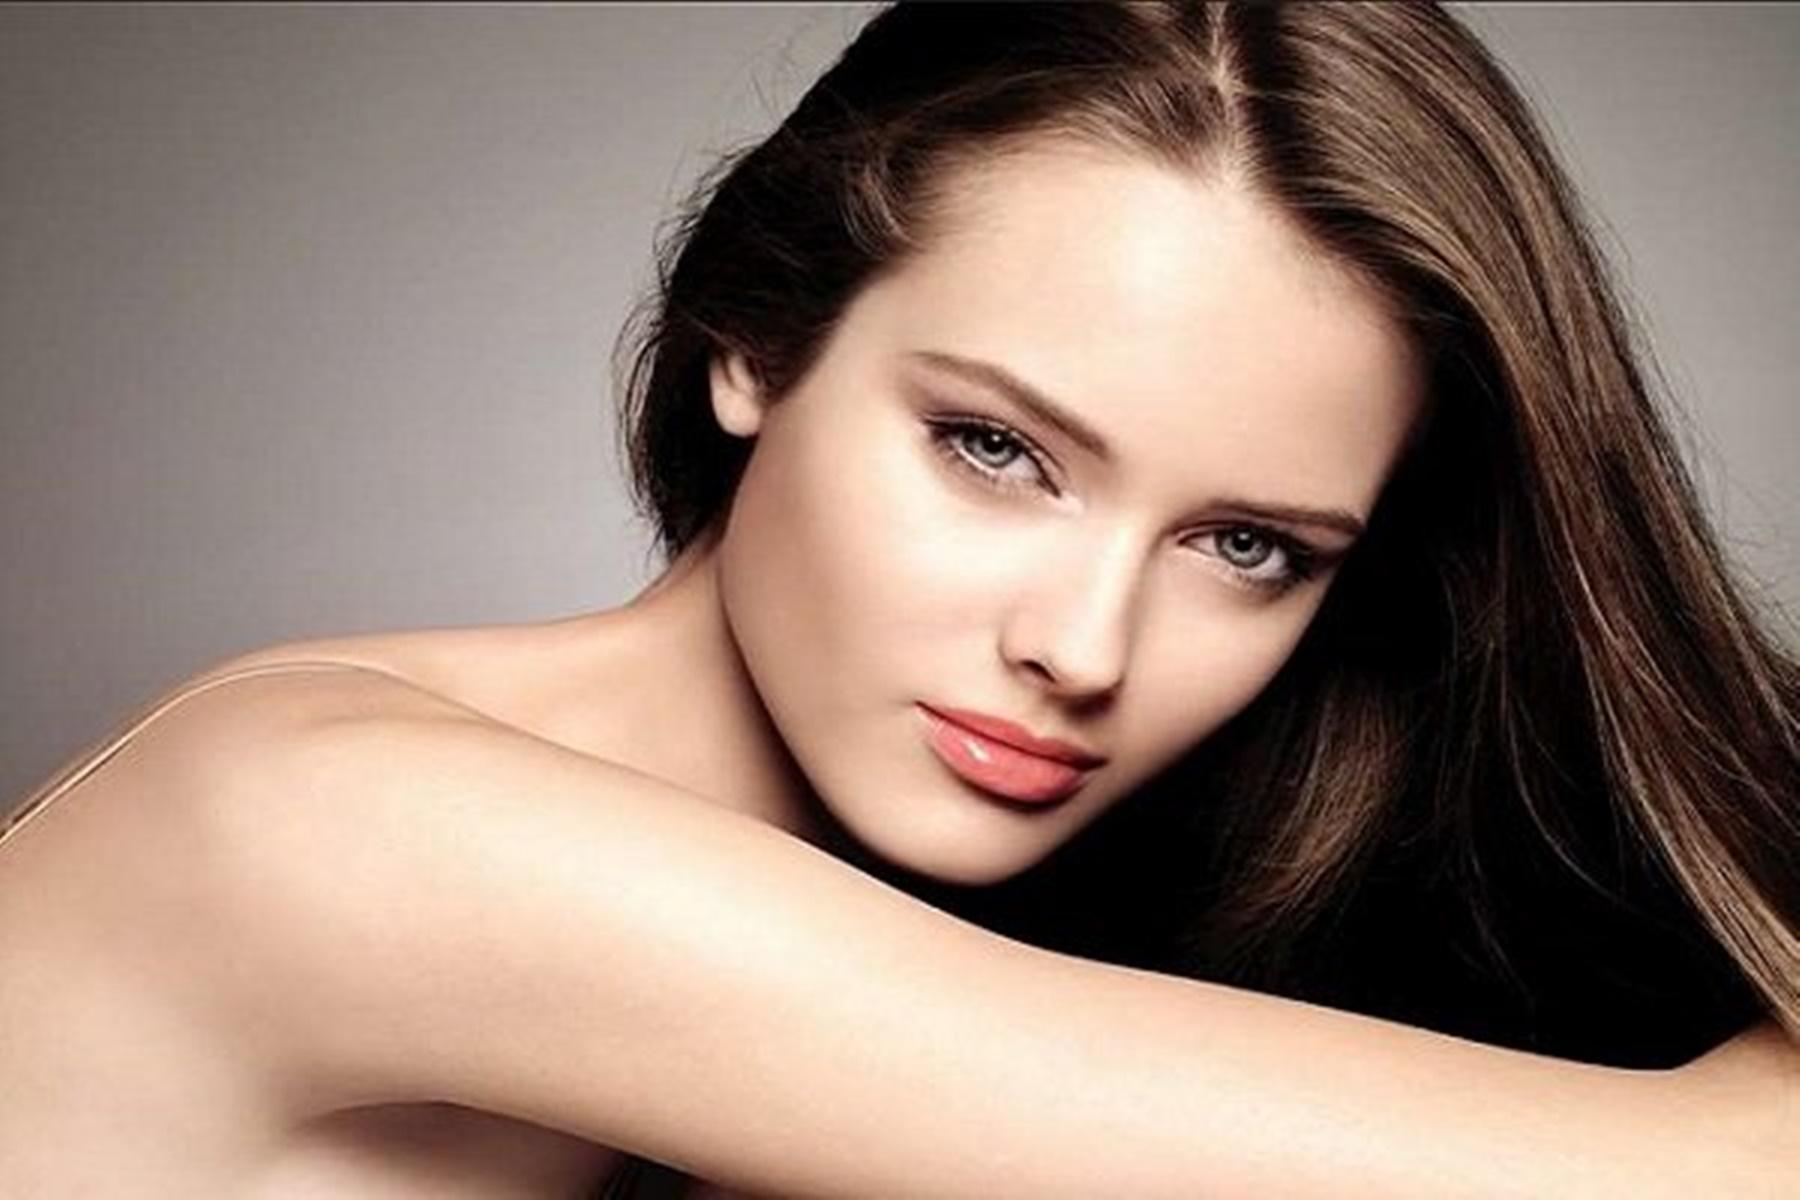 Tips ομορφιάς : Έτσι θα επεκτείνετε το προσδόκιμο ζωής της επιδερμίδας σας